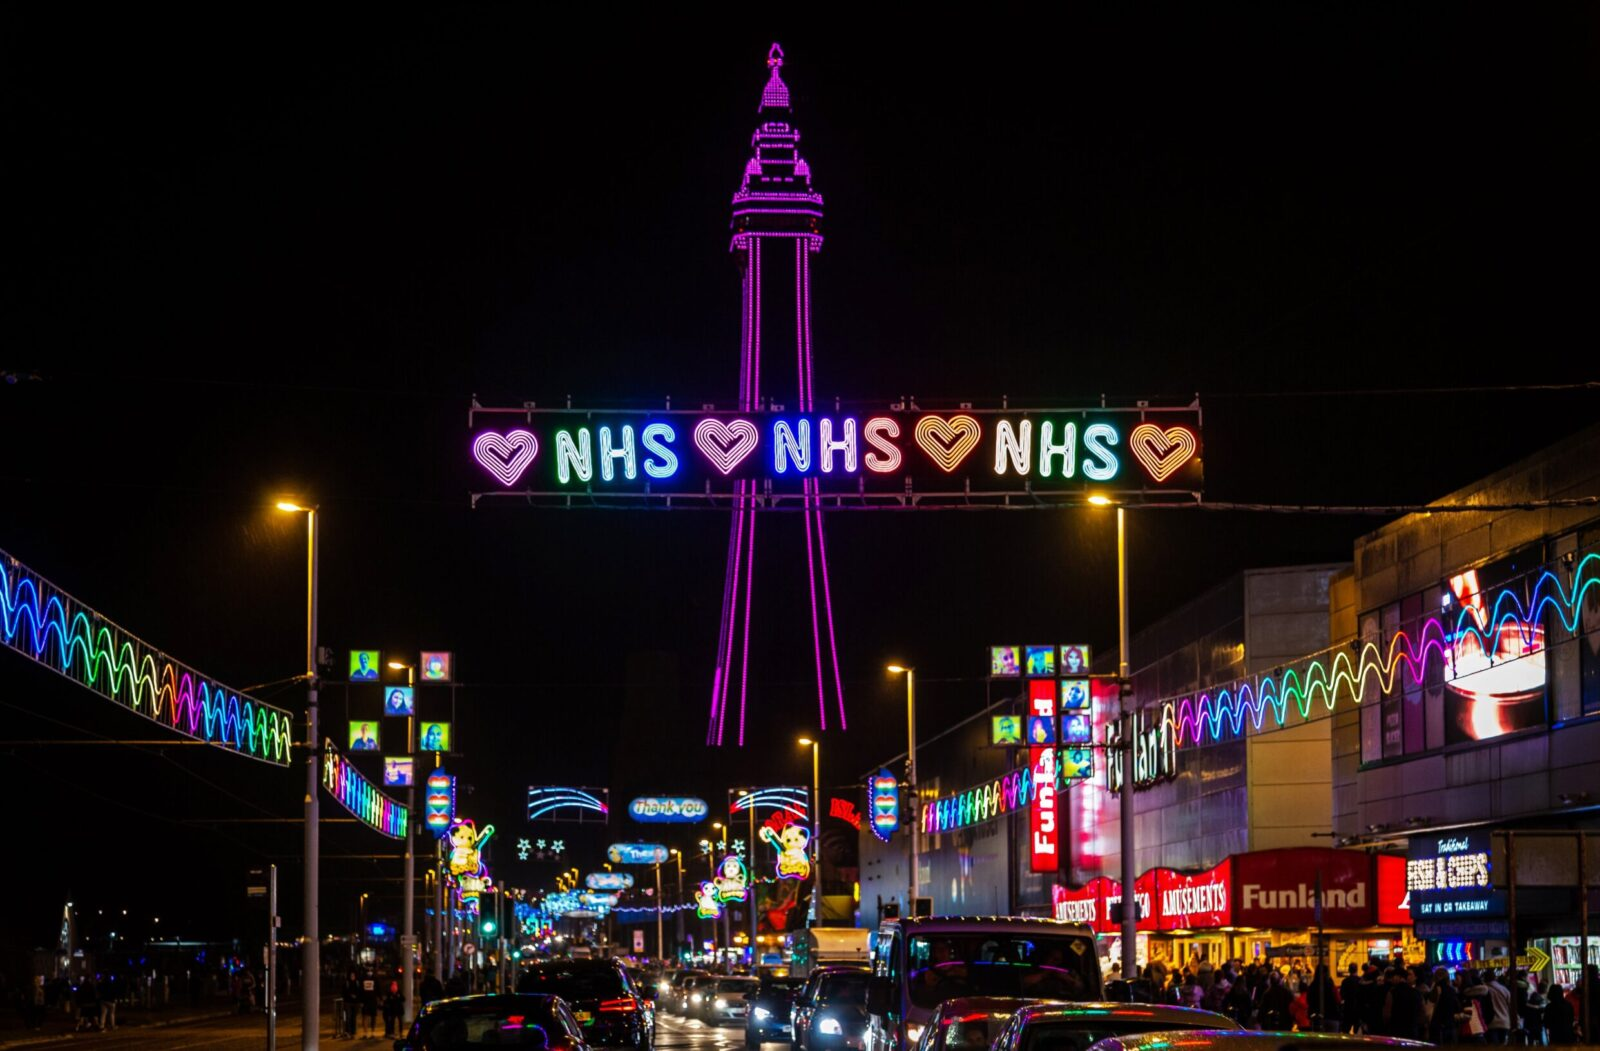 Blackpool Illuminations will be switched back on next Wednesday, The Manc